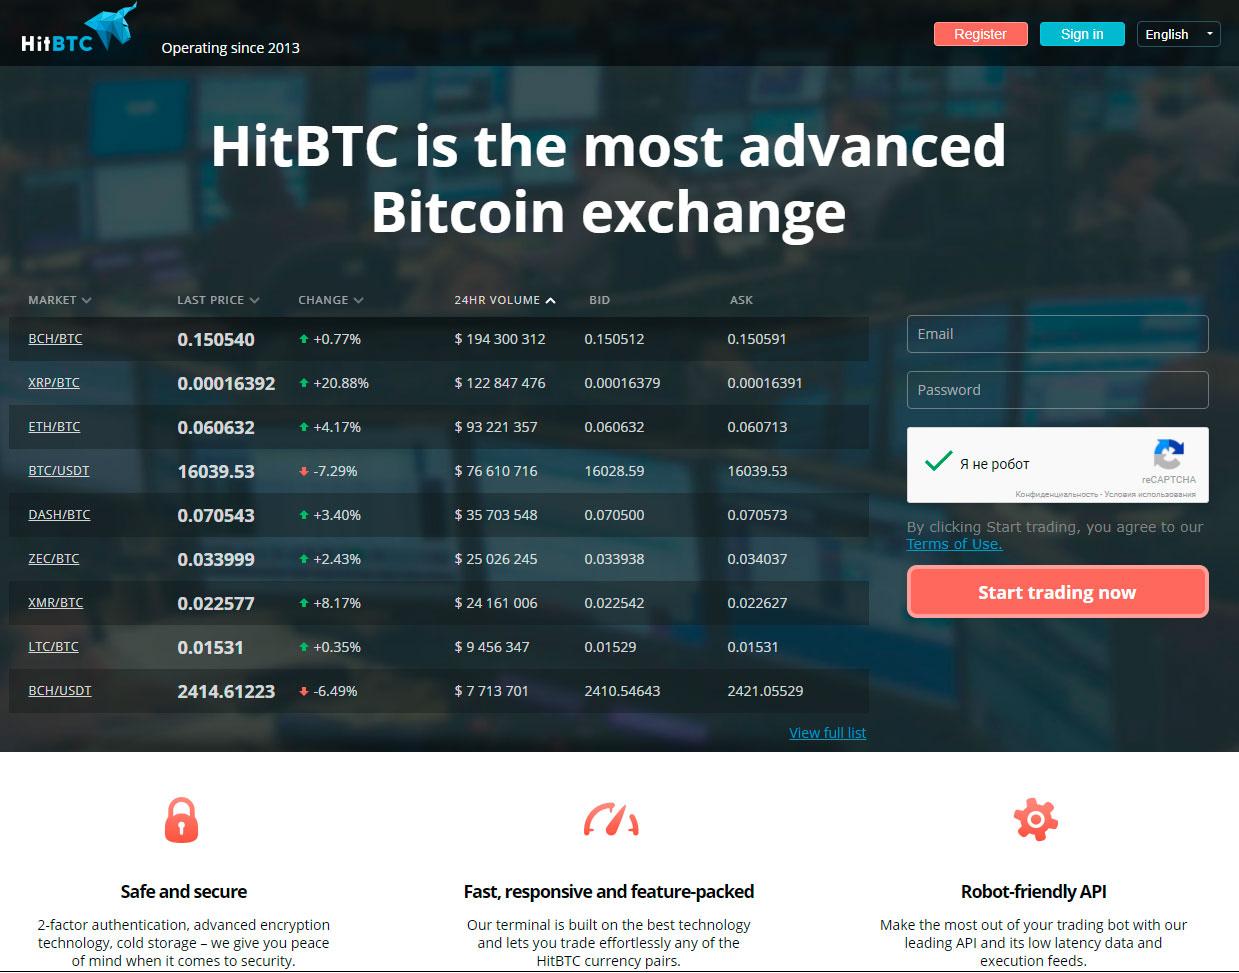 hitbtc-2018